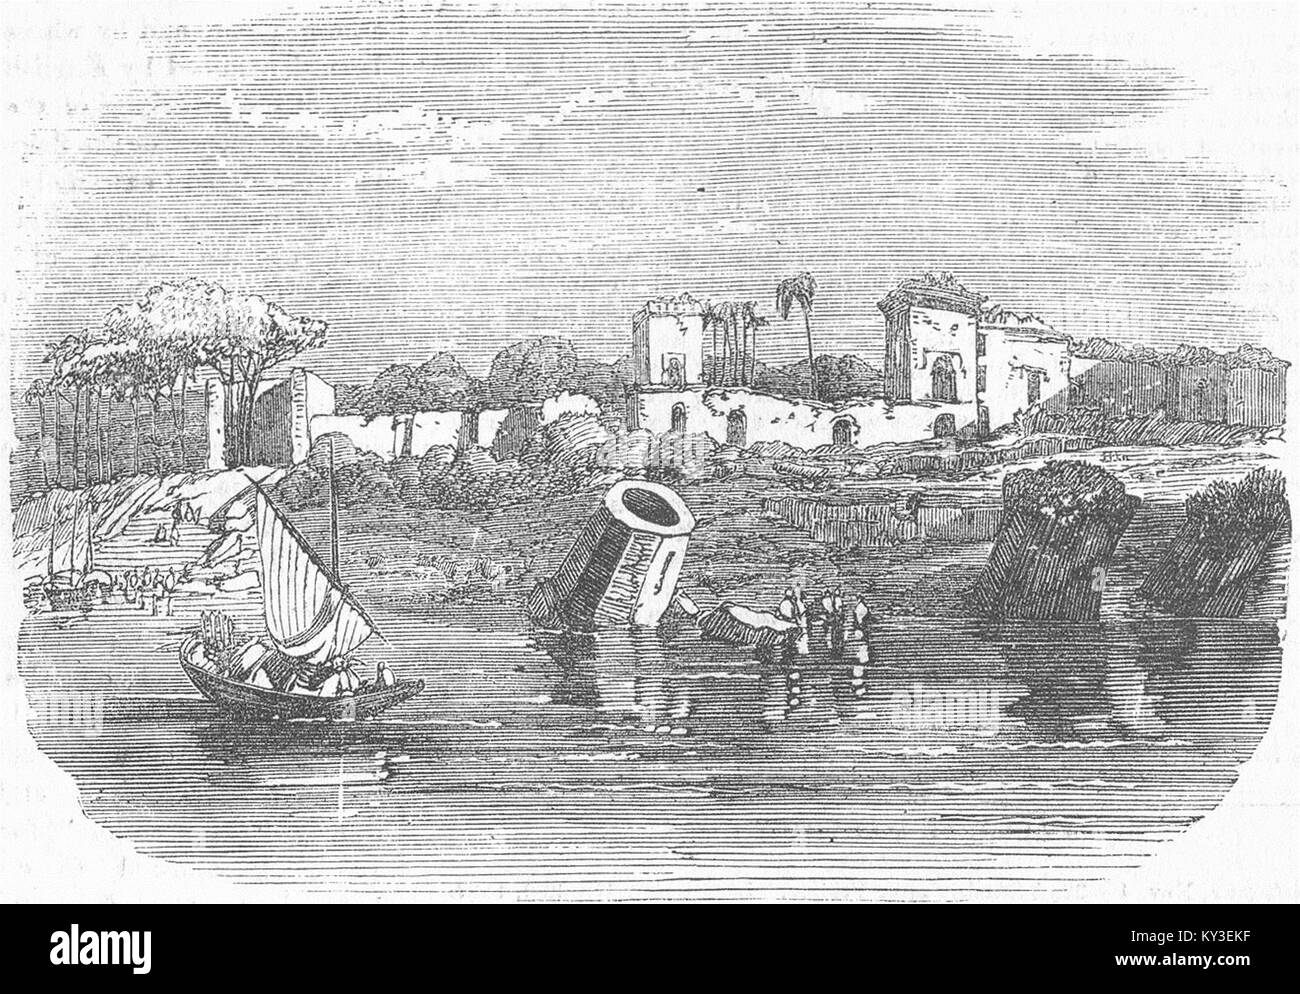 TOWNS Ruins of Mahometan Palace, Raj Mah'l, Ganges 1855. Illustrated London News - Stock Image